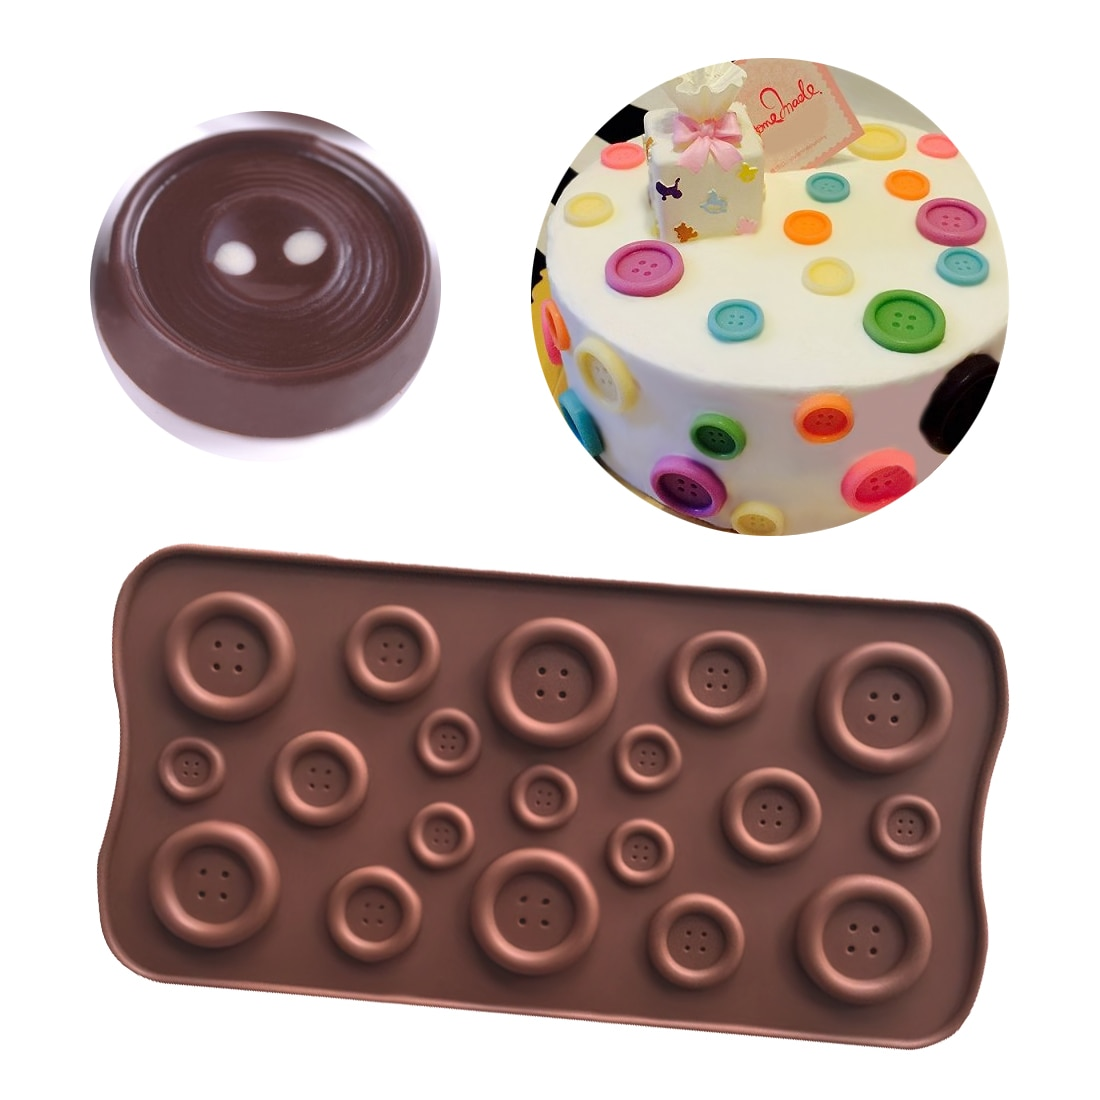 Molde de silicona con forma de botón bonito molde de jabón de jalea Chocolate DIY herramientas de decoración de pasteles horneados accesorios de cocina recipientes para hornear